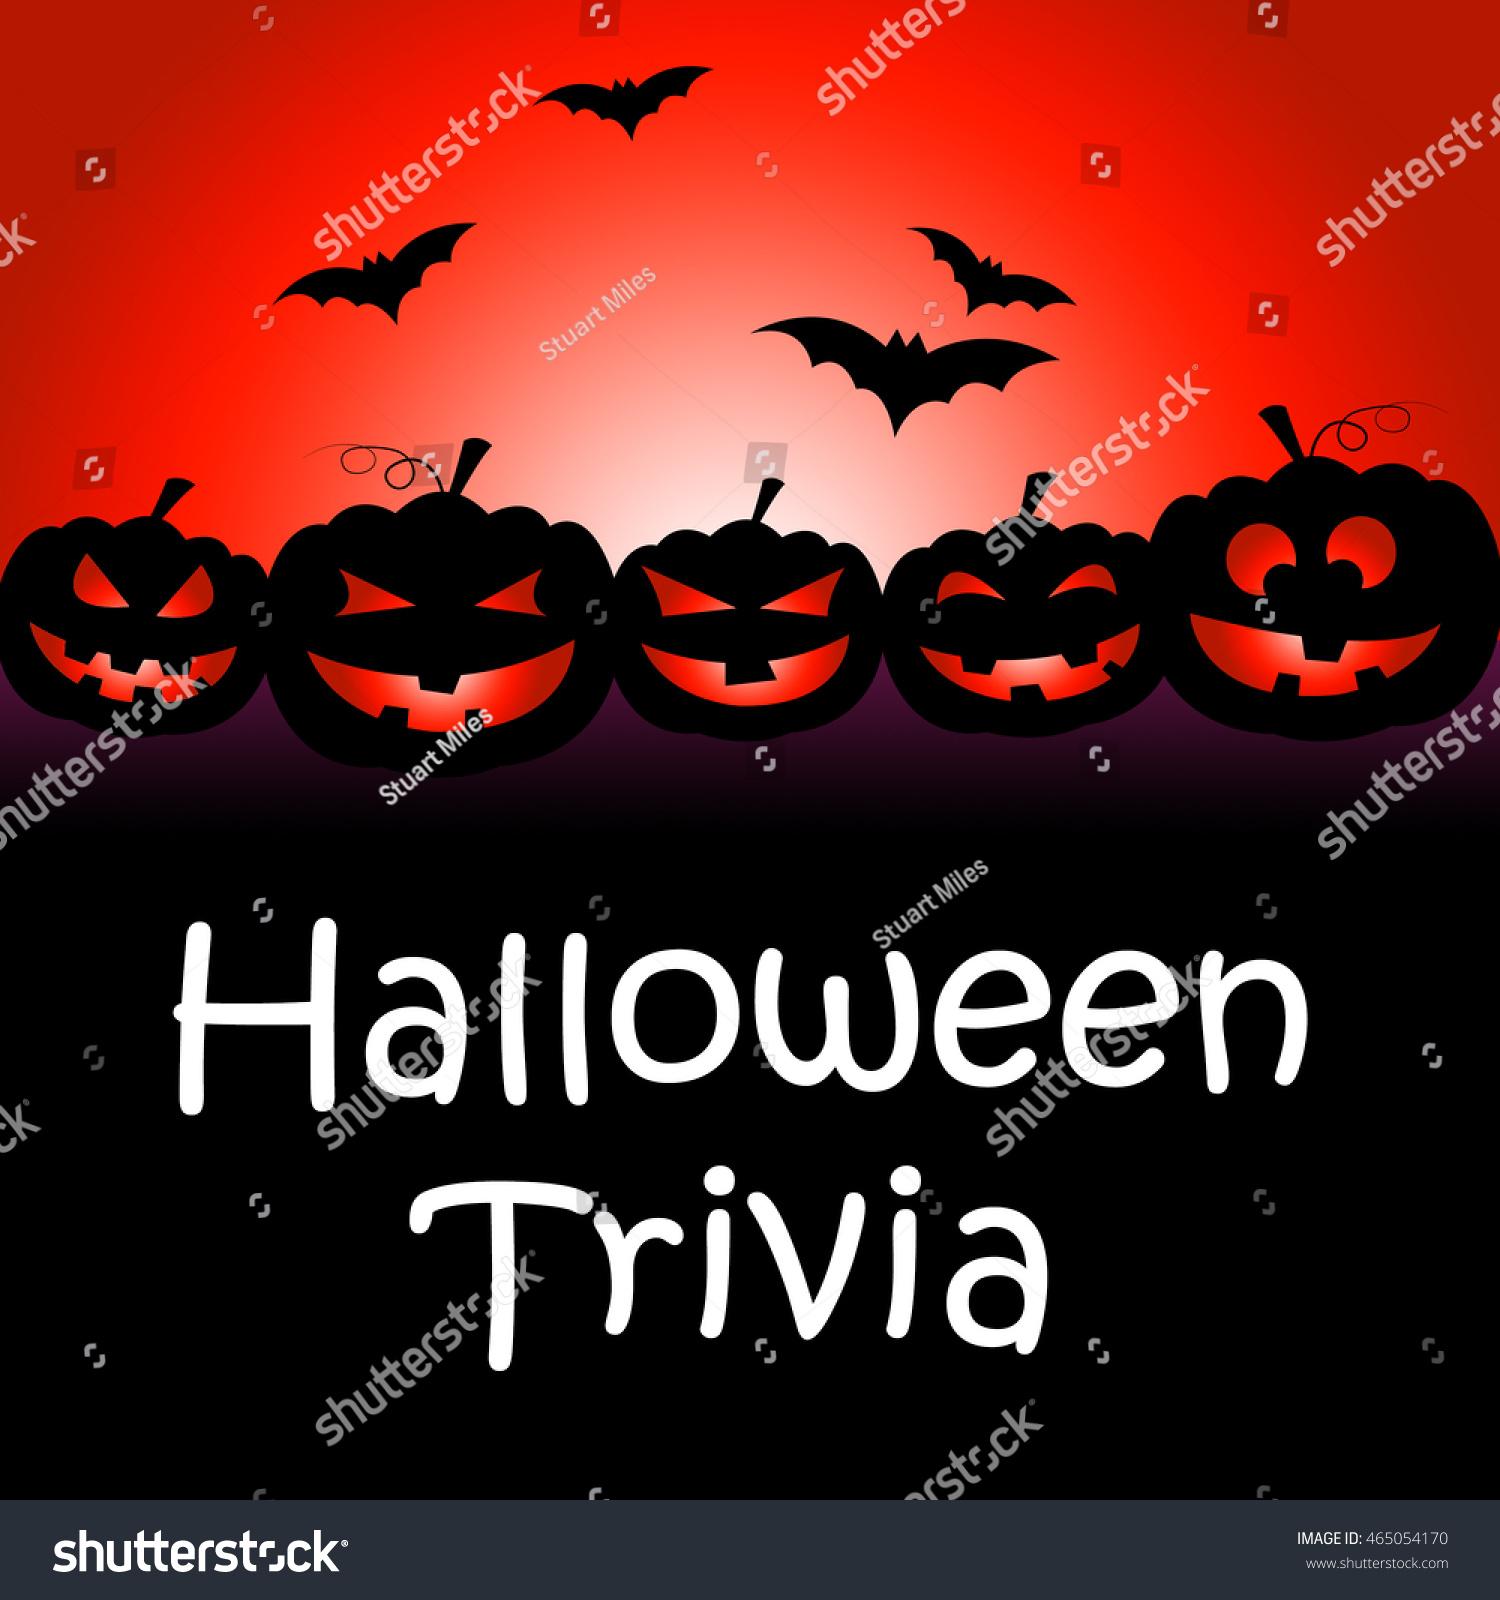 Halloween Trivia Showing Trick Treat Celebration Stock ...